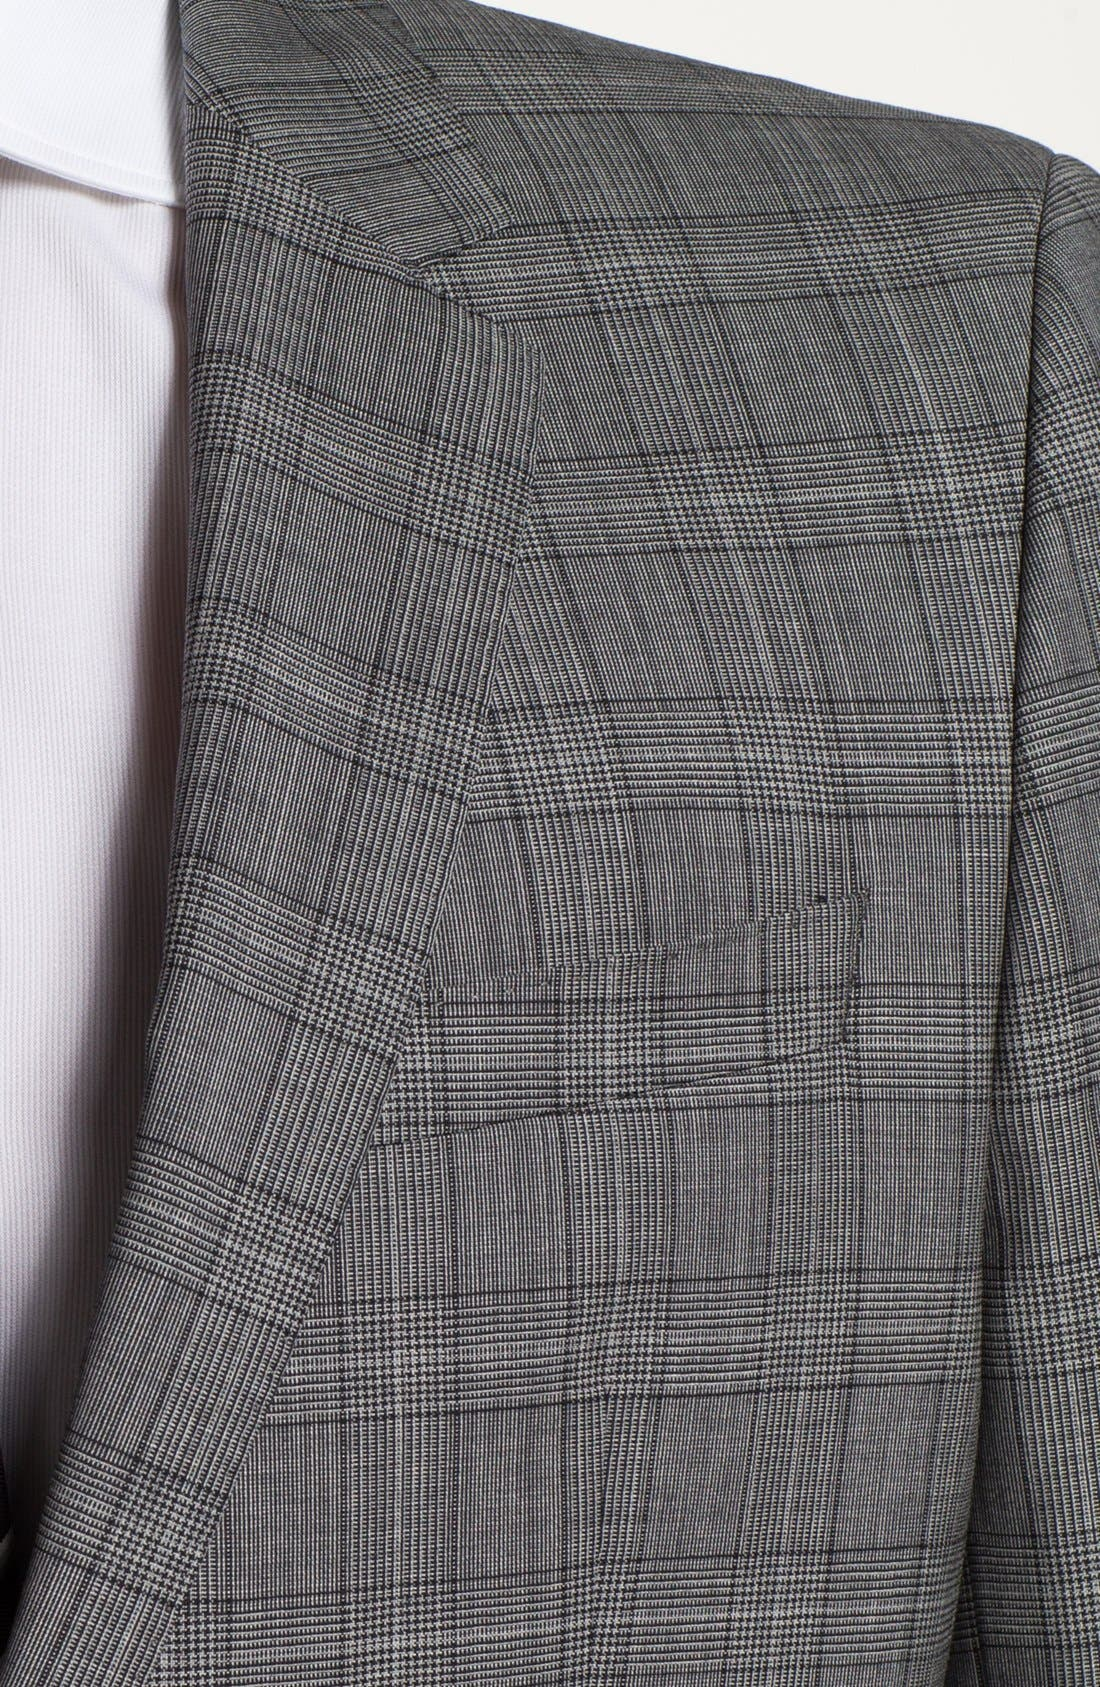 Alternate Image 2  - BOSS HUGO BOSS 'Huge/Genius' Extra Trim Fit Plaid Suit